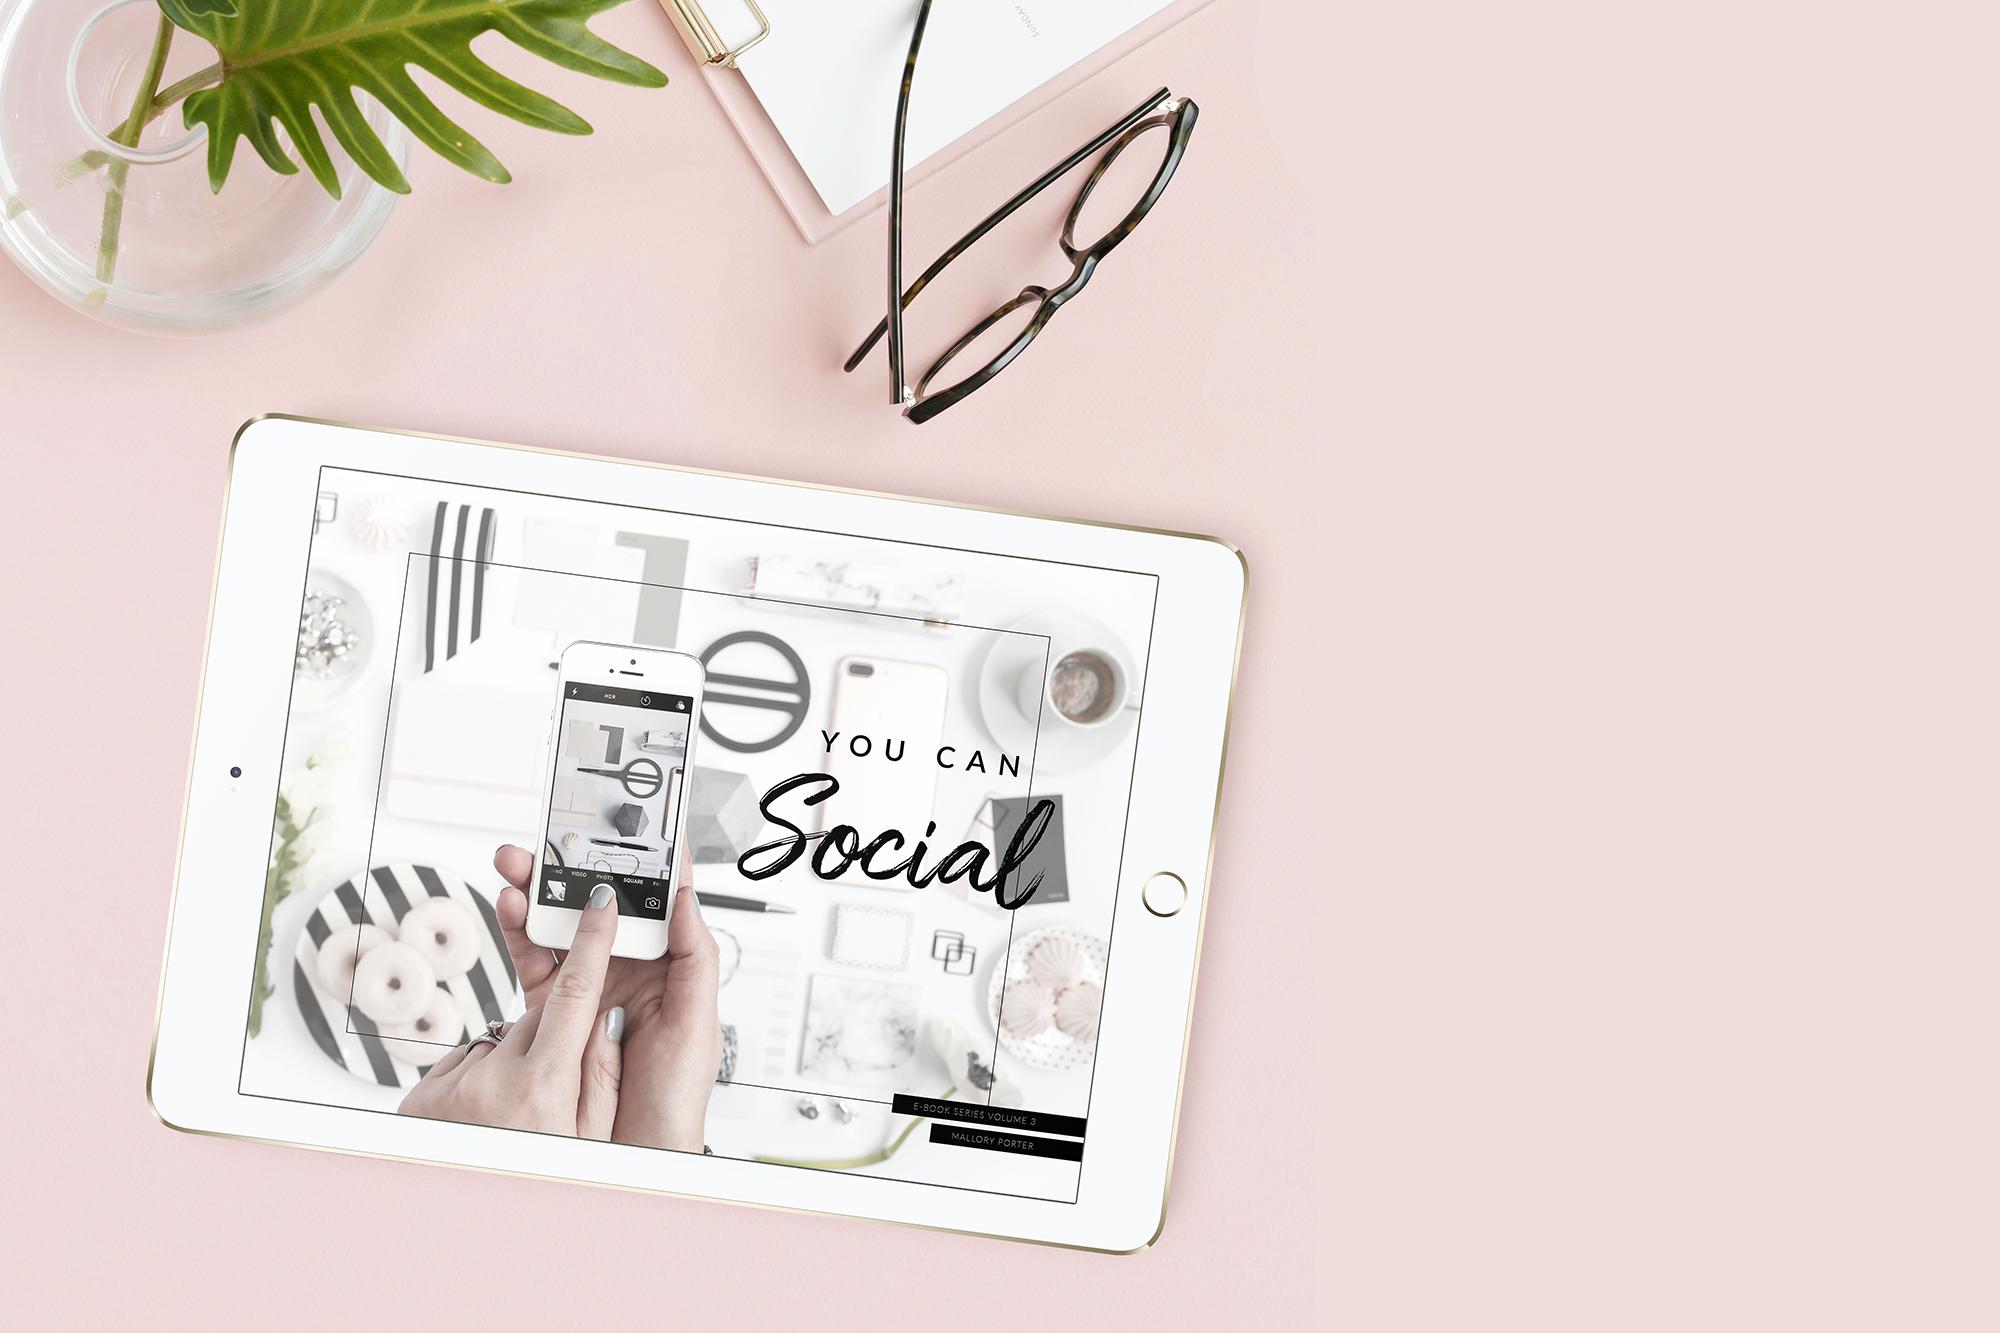 You Can social - Filament society